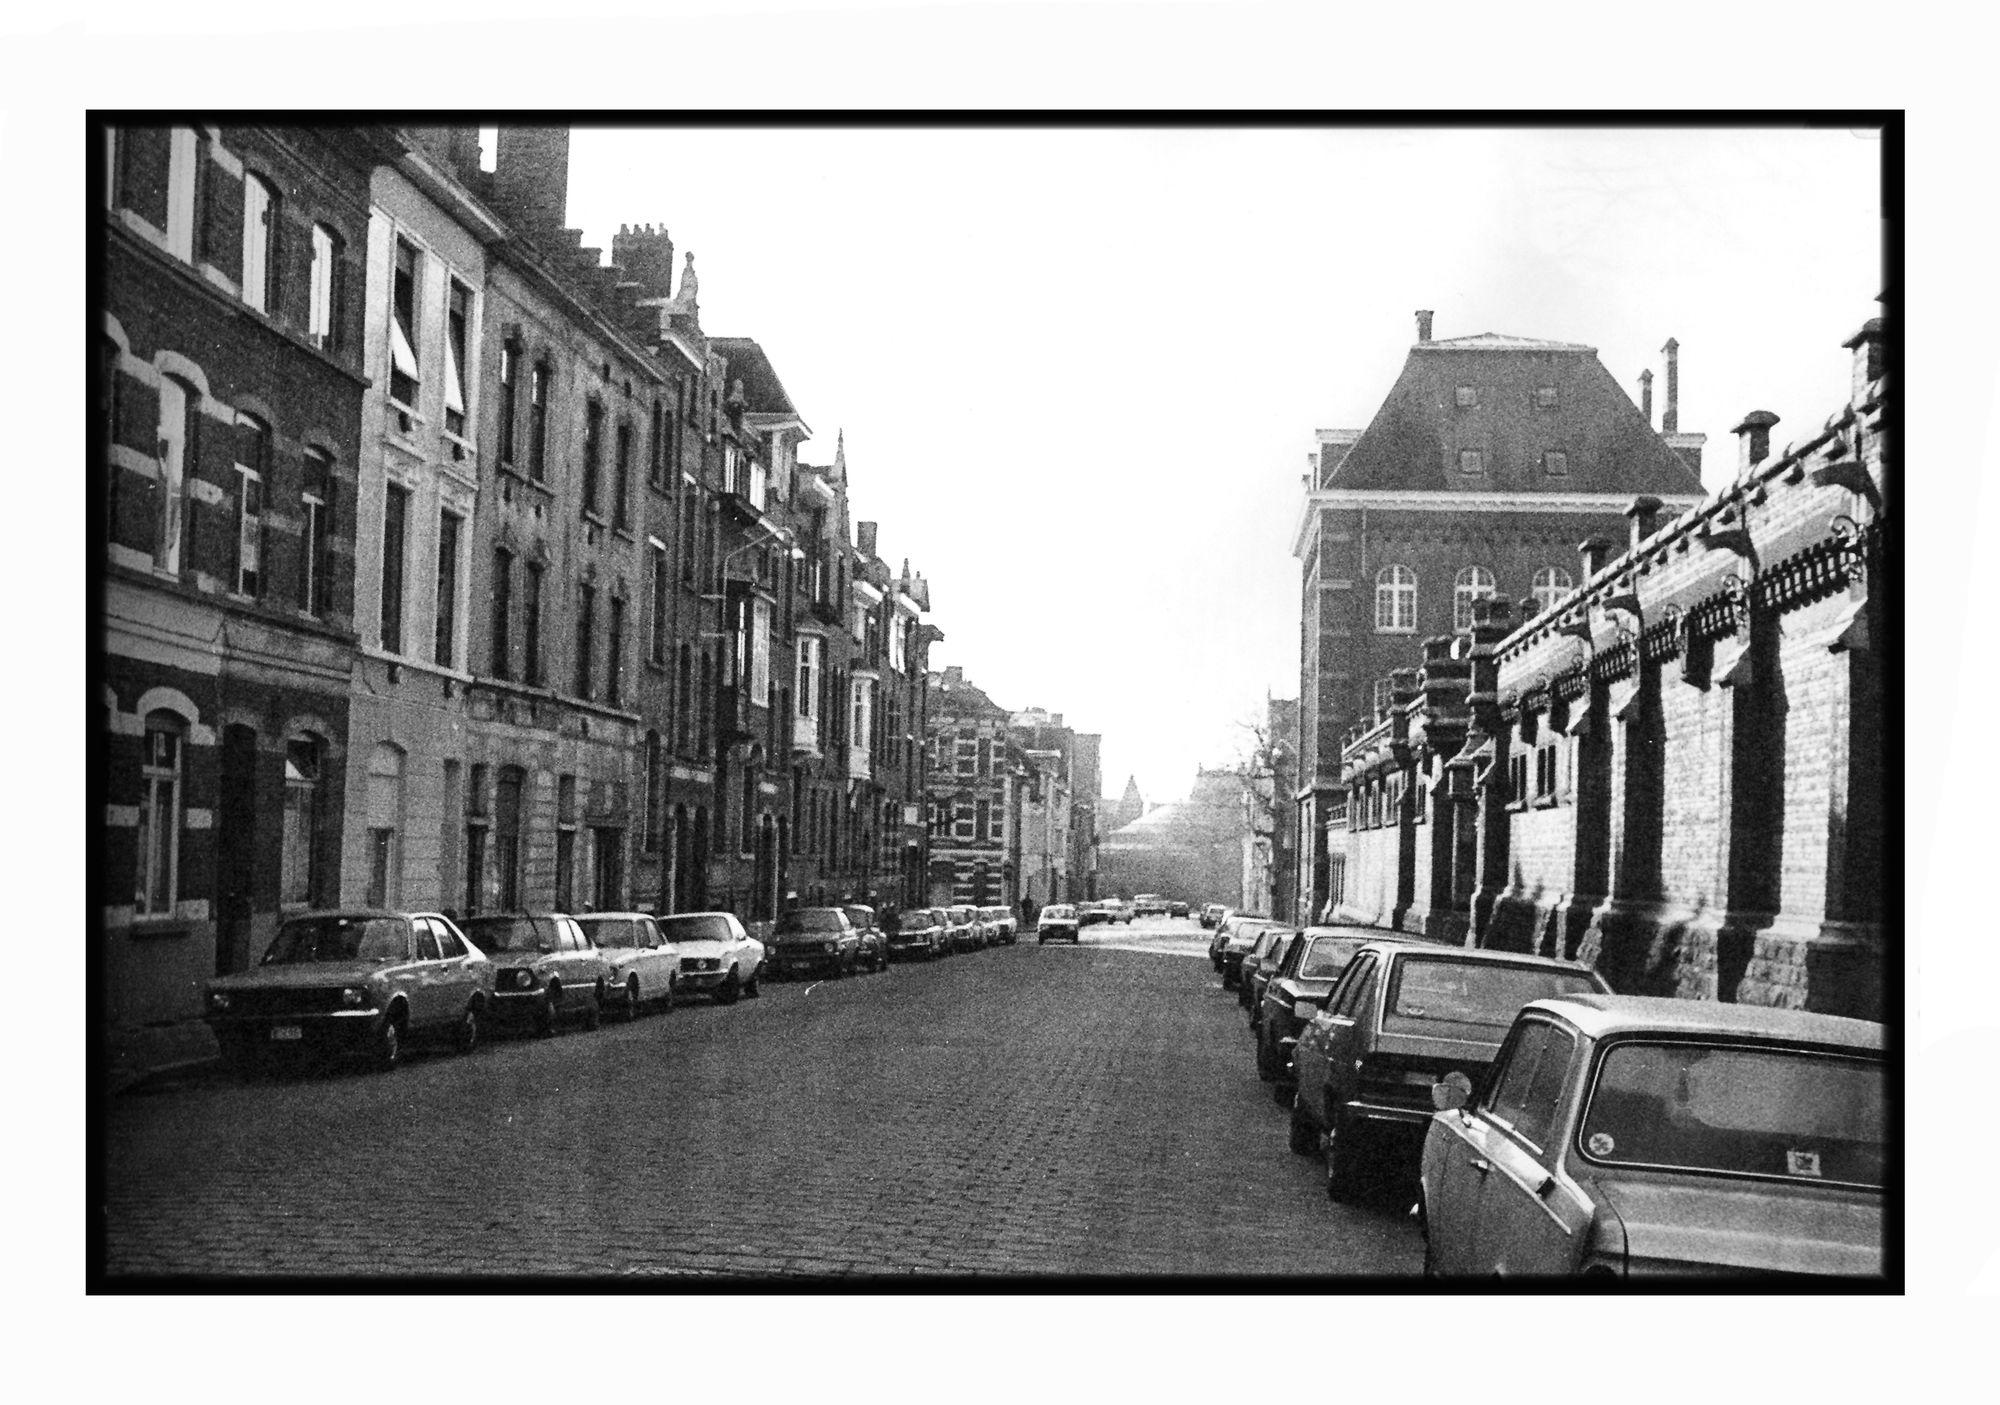 Kattenberg05_1979.jpg